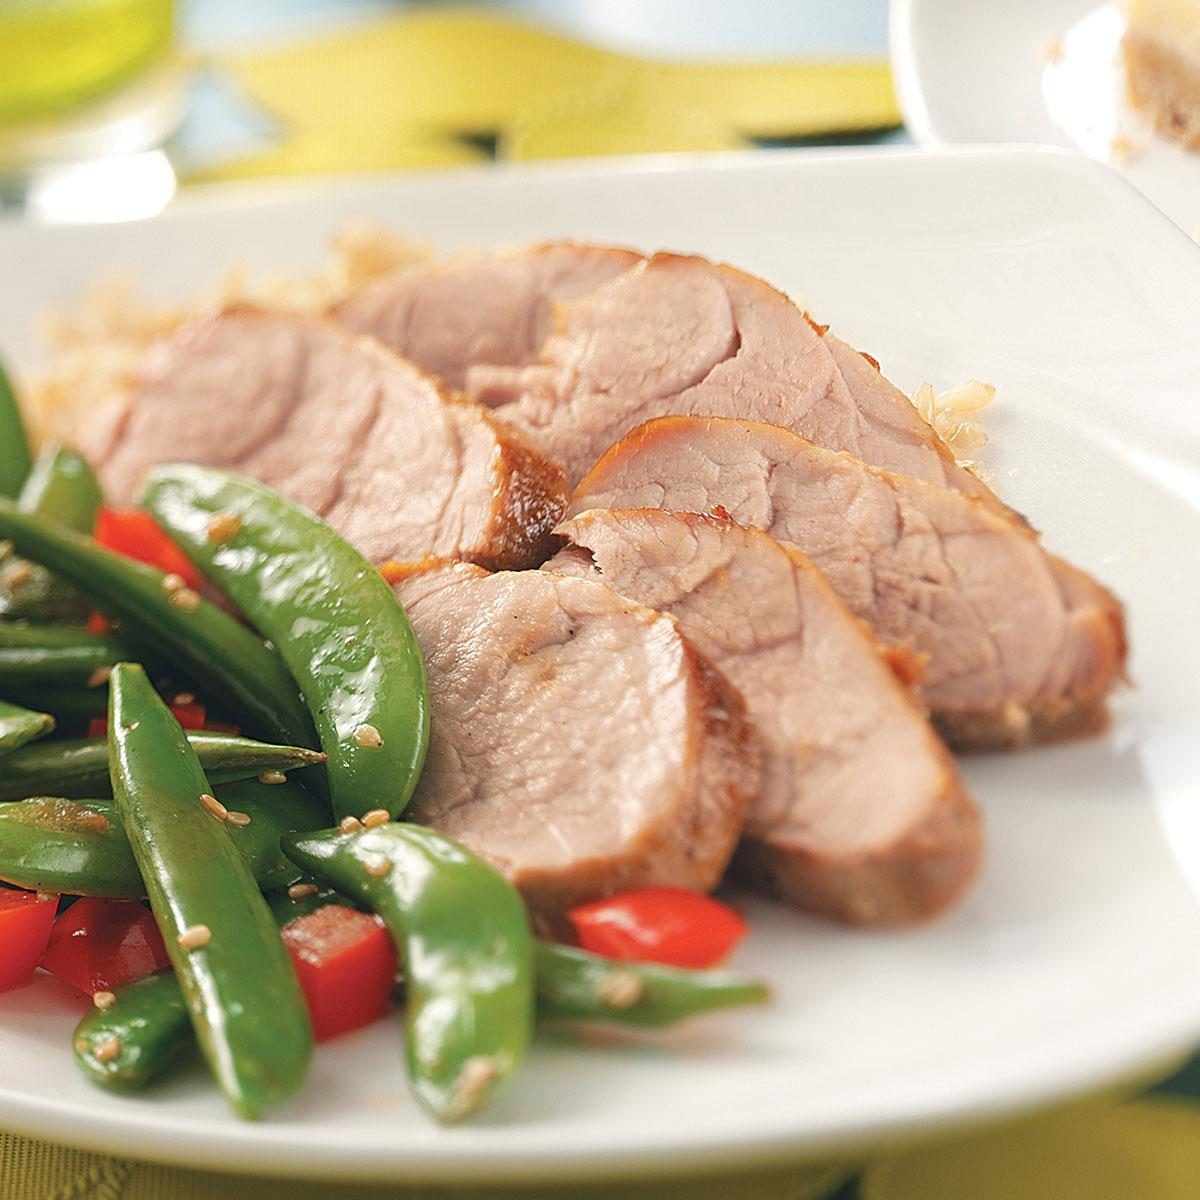 Chinese Pork Tenderloin: Marinated Asian Pork Tenderloin Recipe